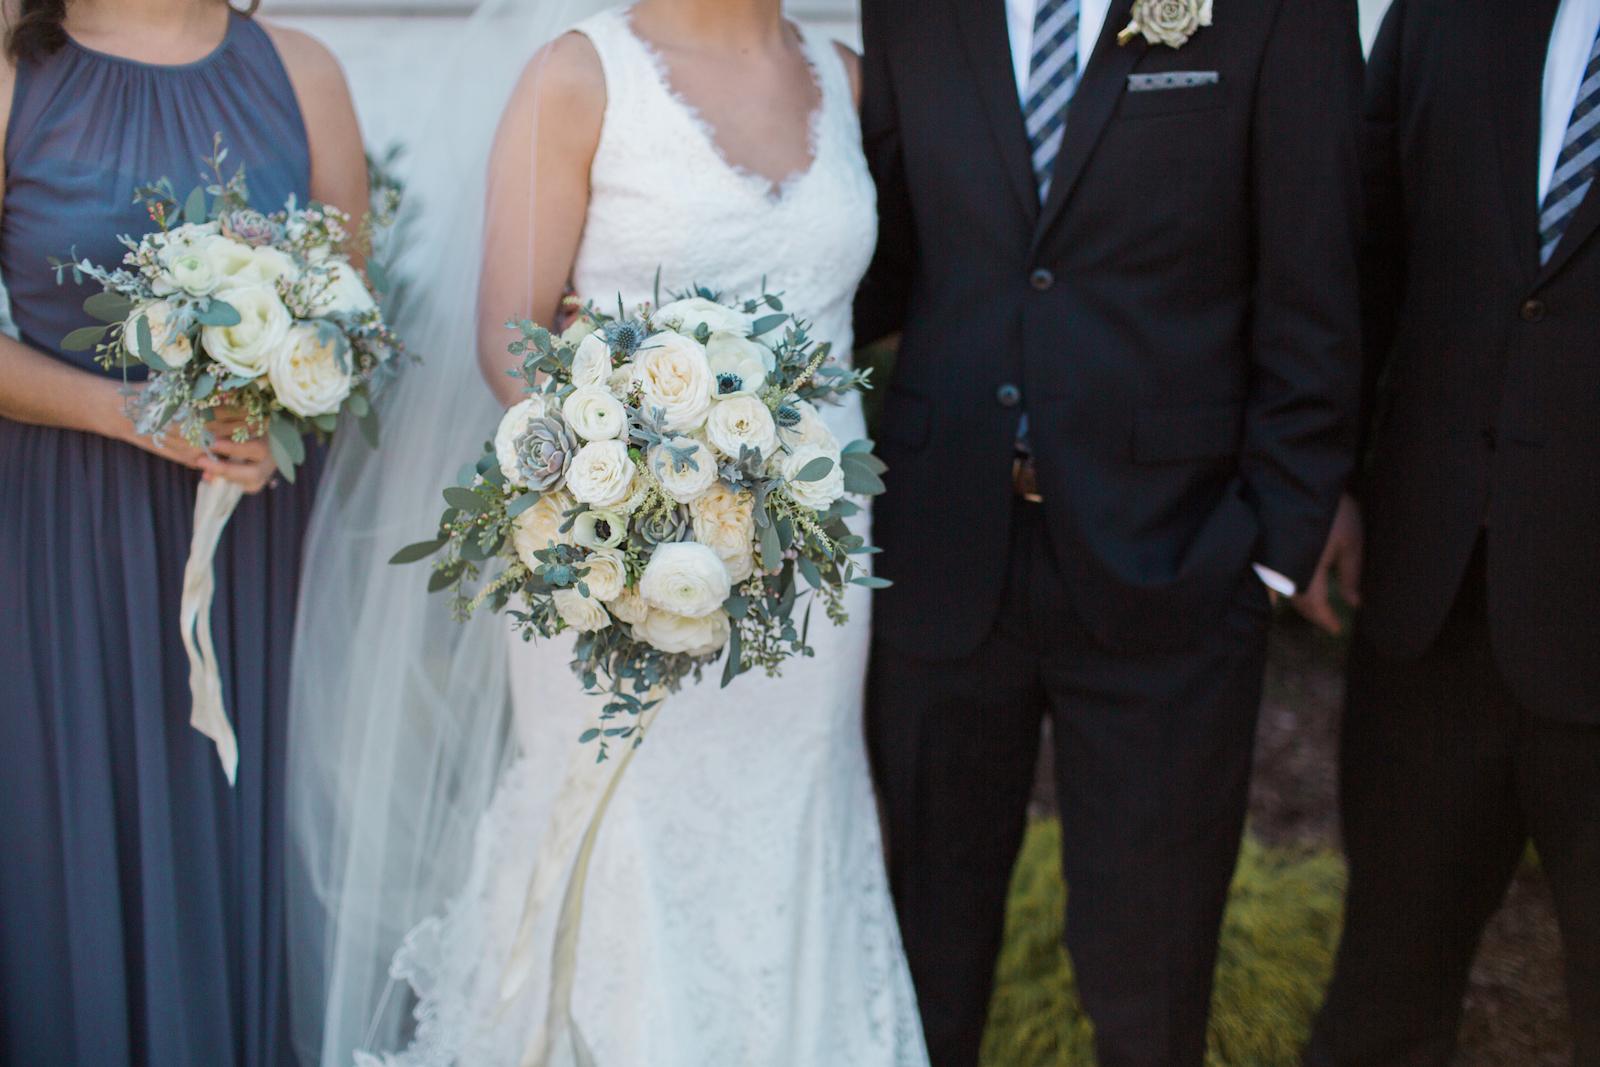 Lush winter wedding bouquet with white florals and anemones // Nashville Florist